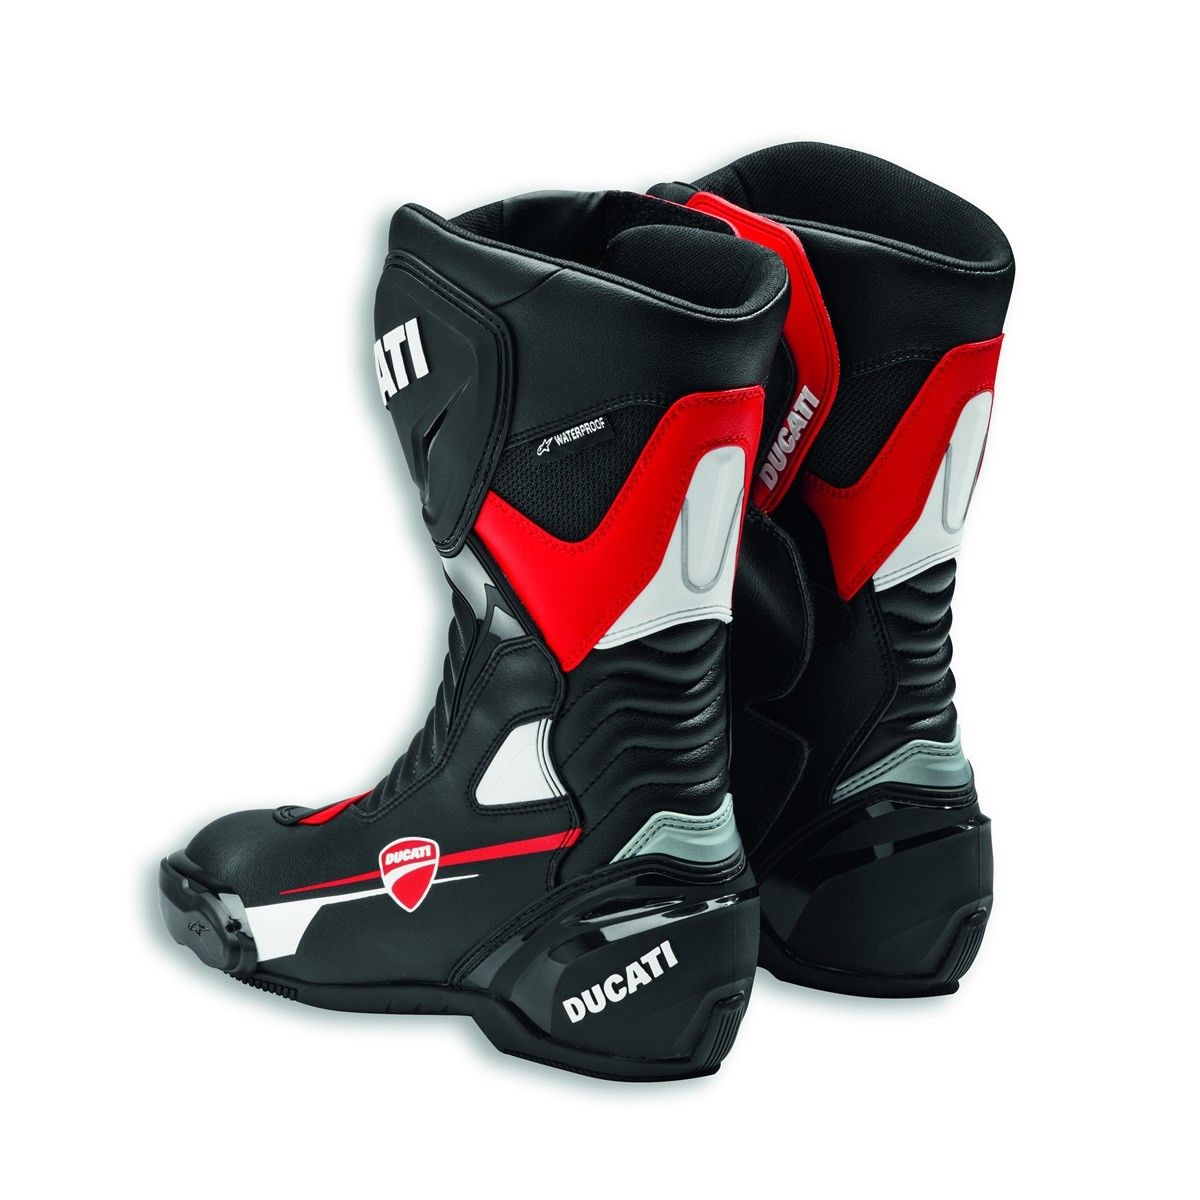 Stiefel Speed C1 Ducati Evo Alpinestars wuXTZiPkOl